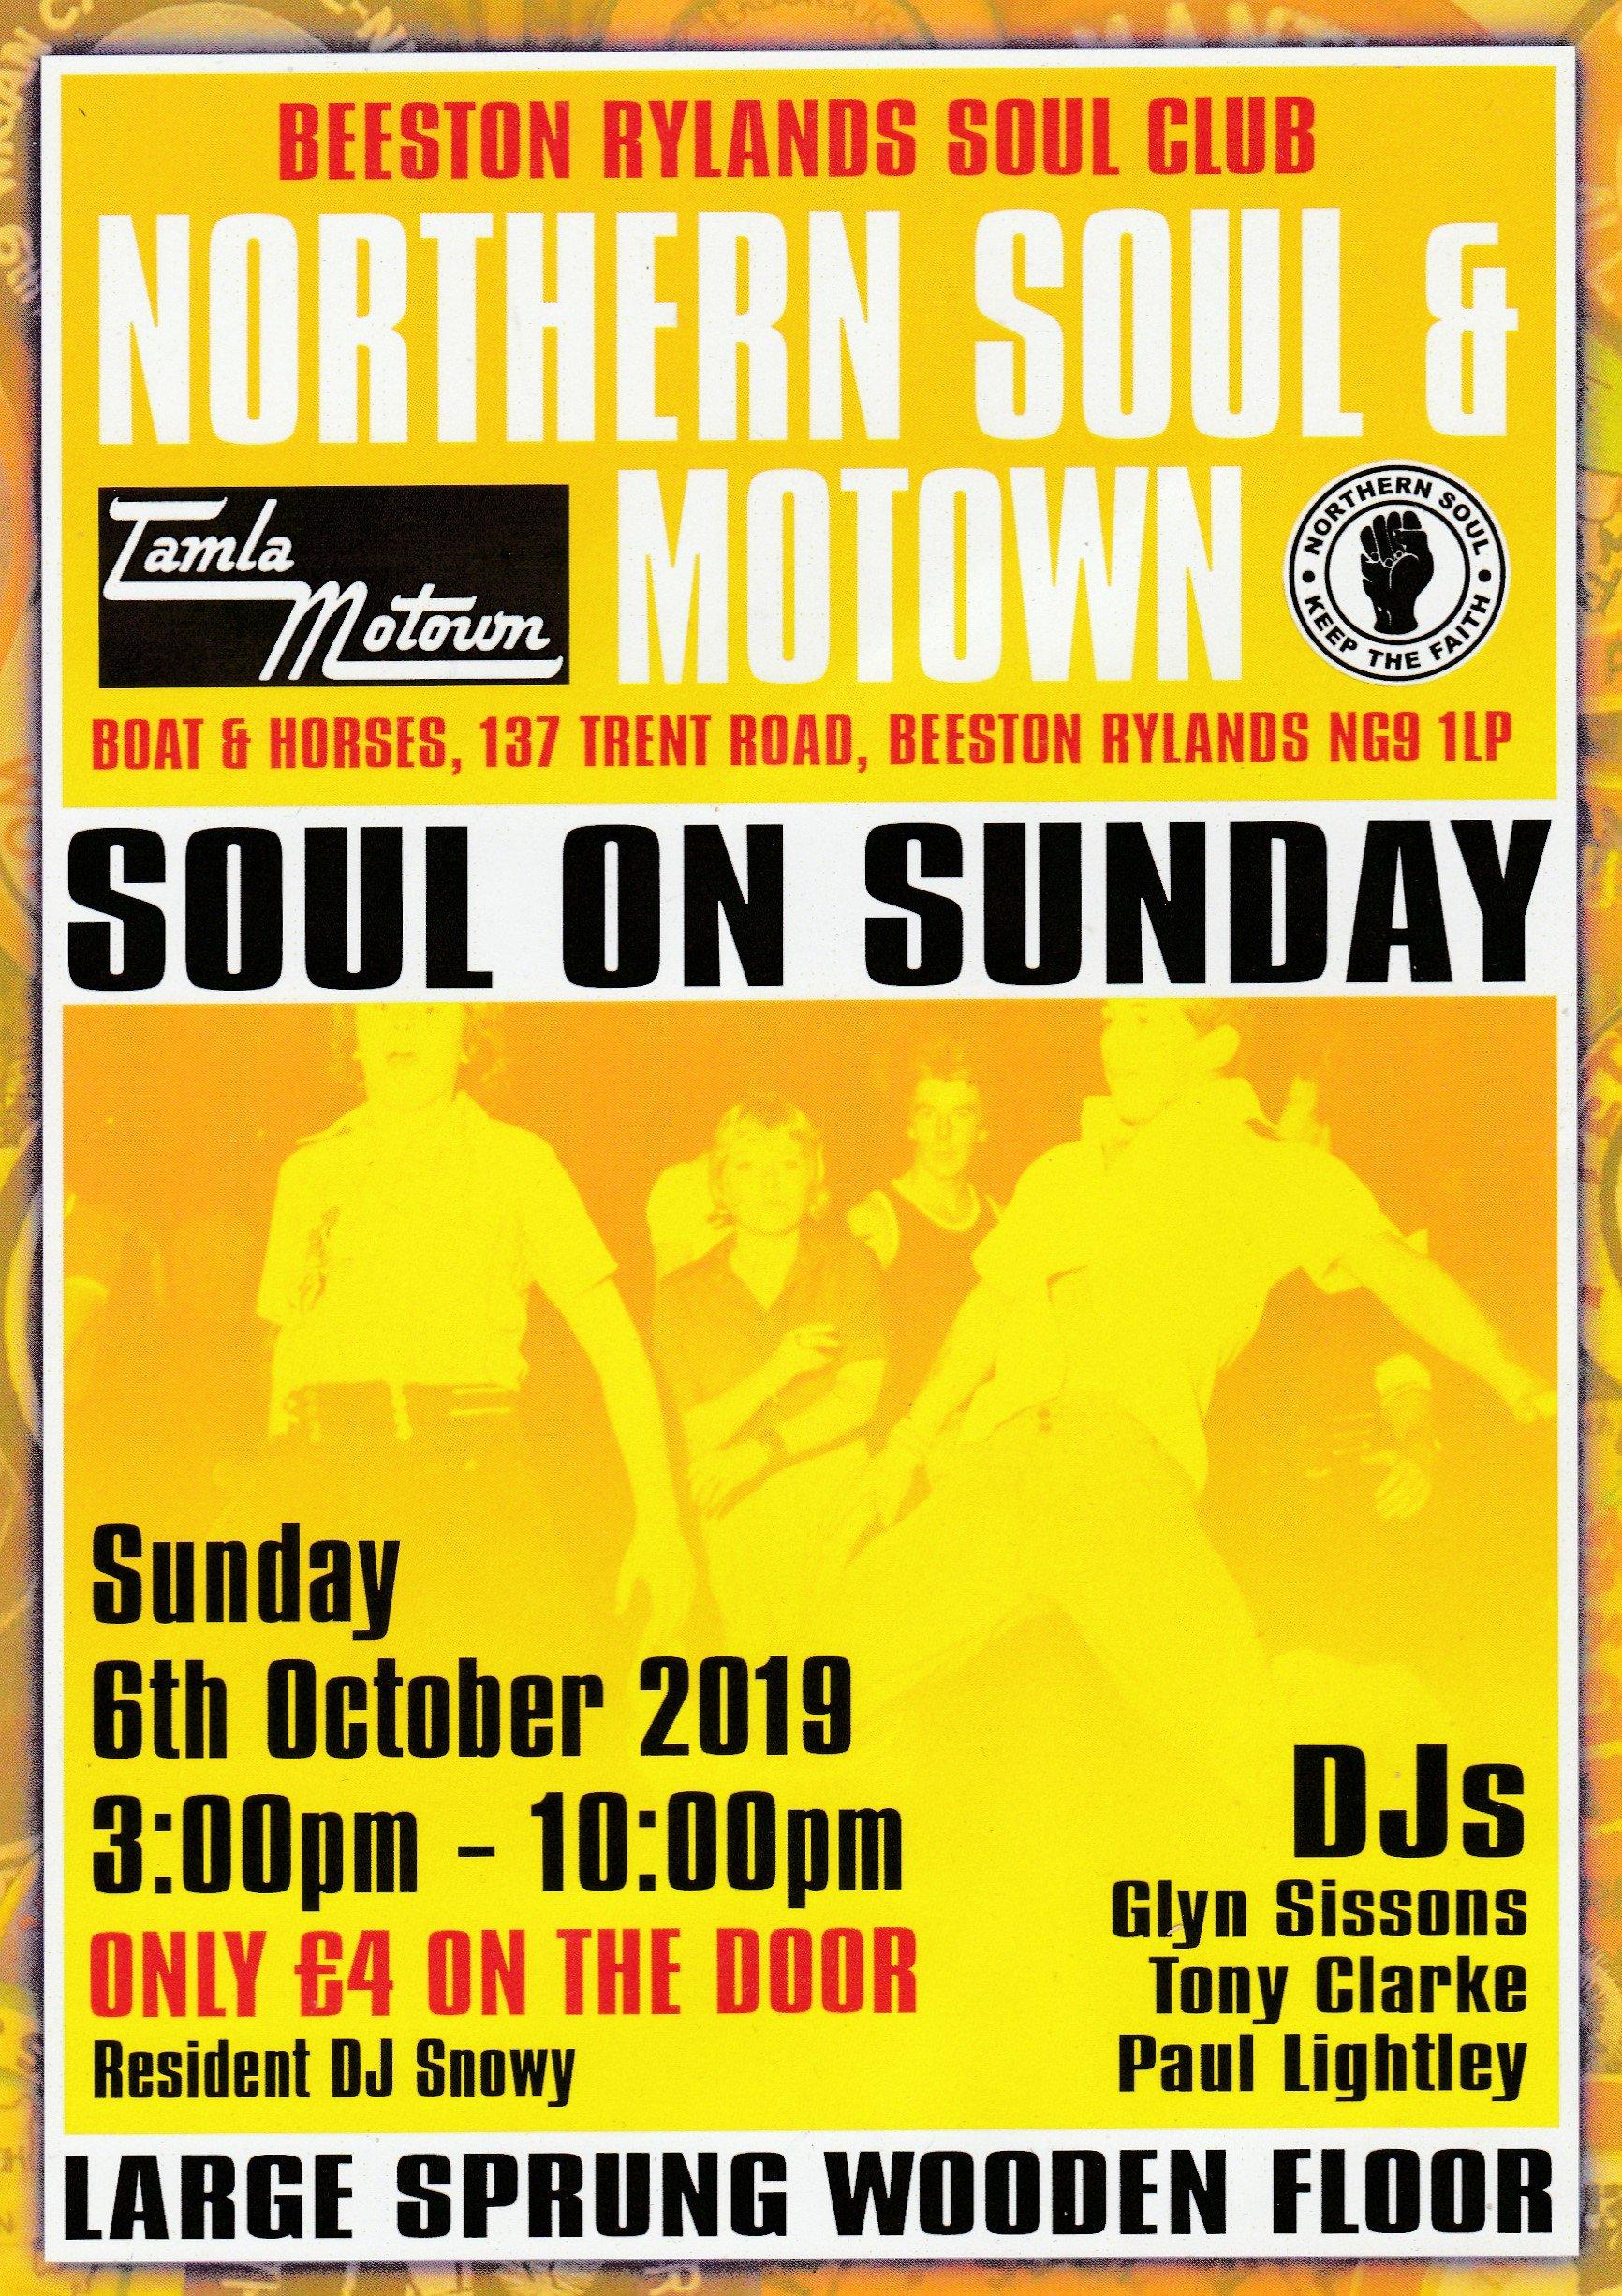 Beeston Rylands Northern Soul  Motown flyer